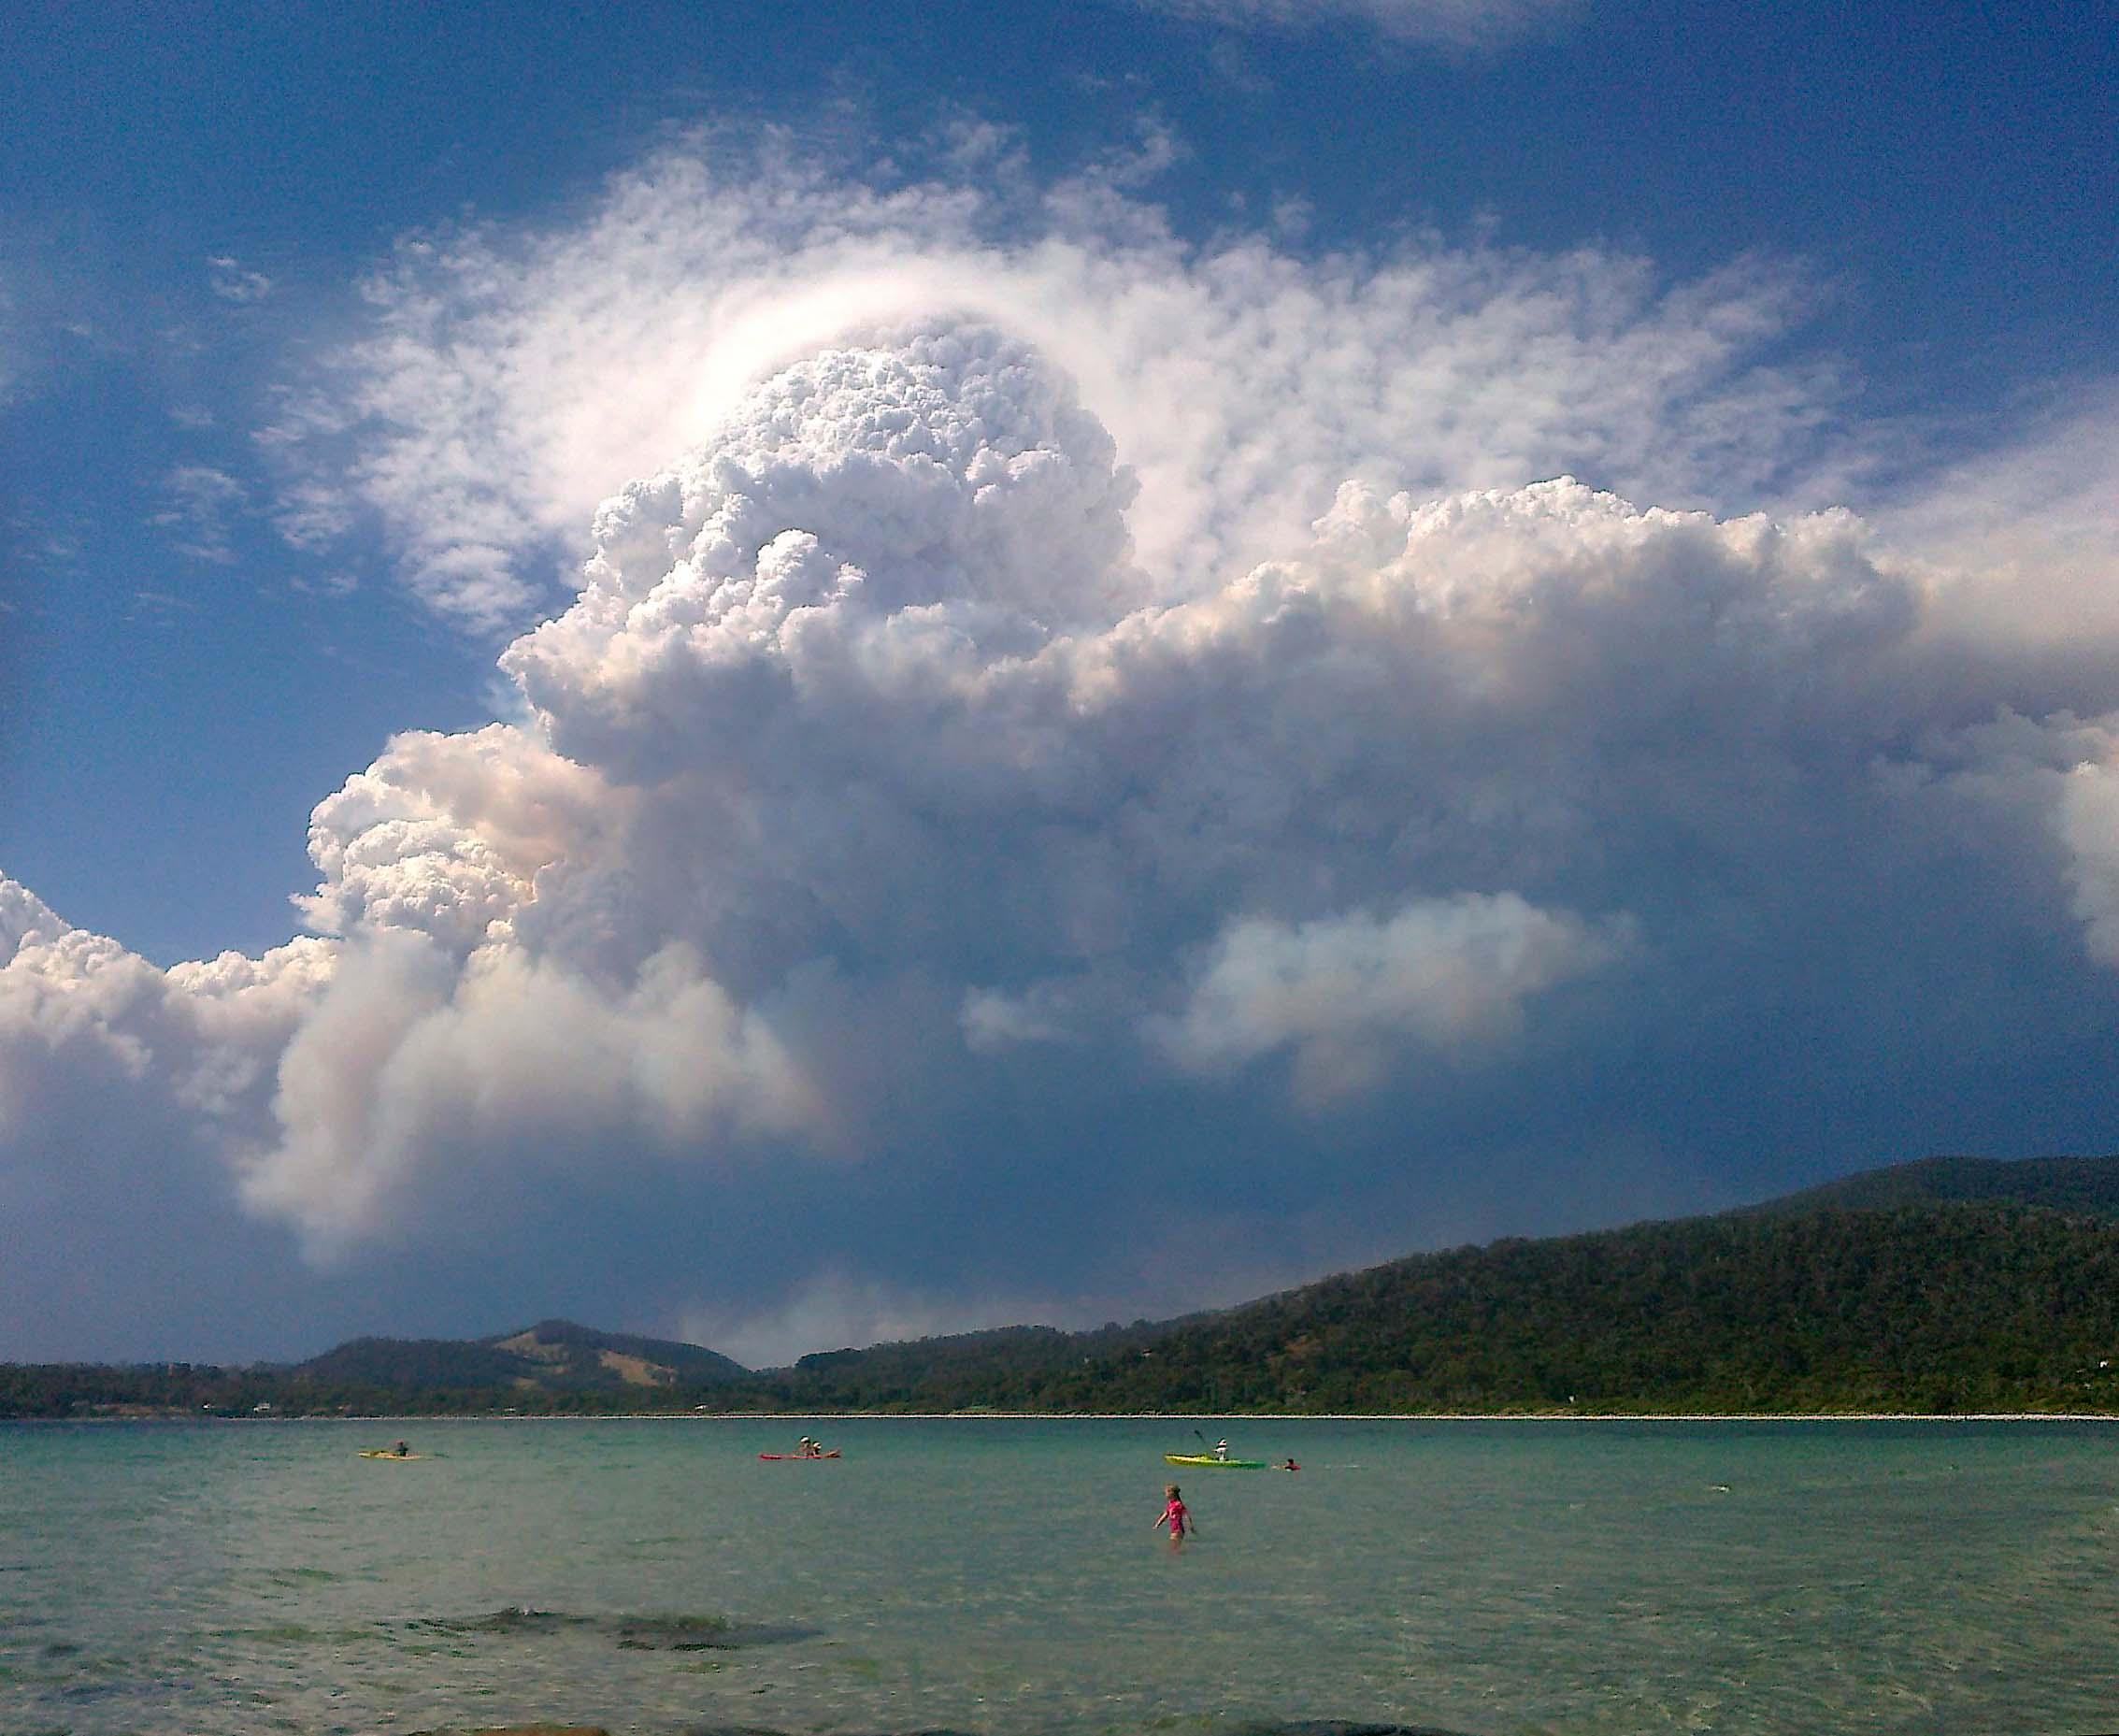 Image: Pyrocumulonimbus cloud forms above a bushfire in Tasmania, 2013. Credit: Janice James